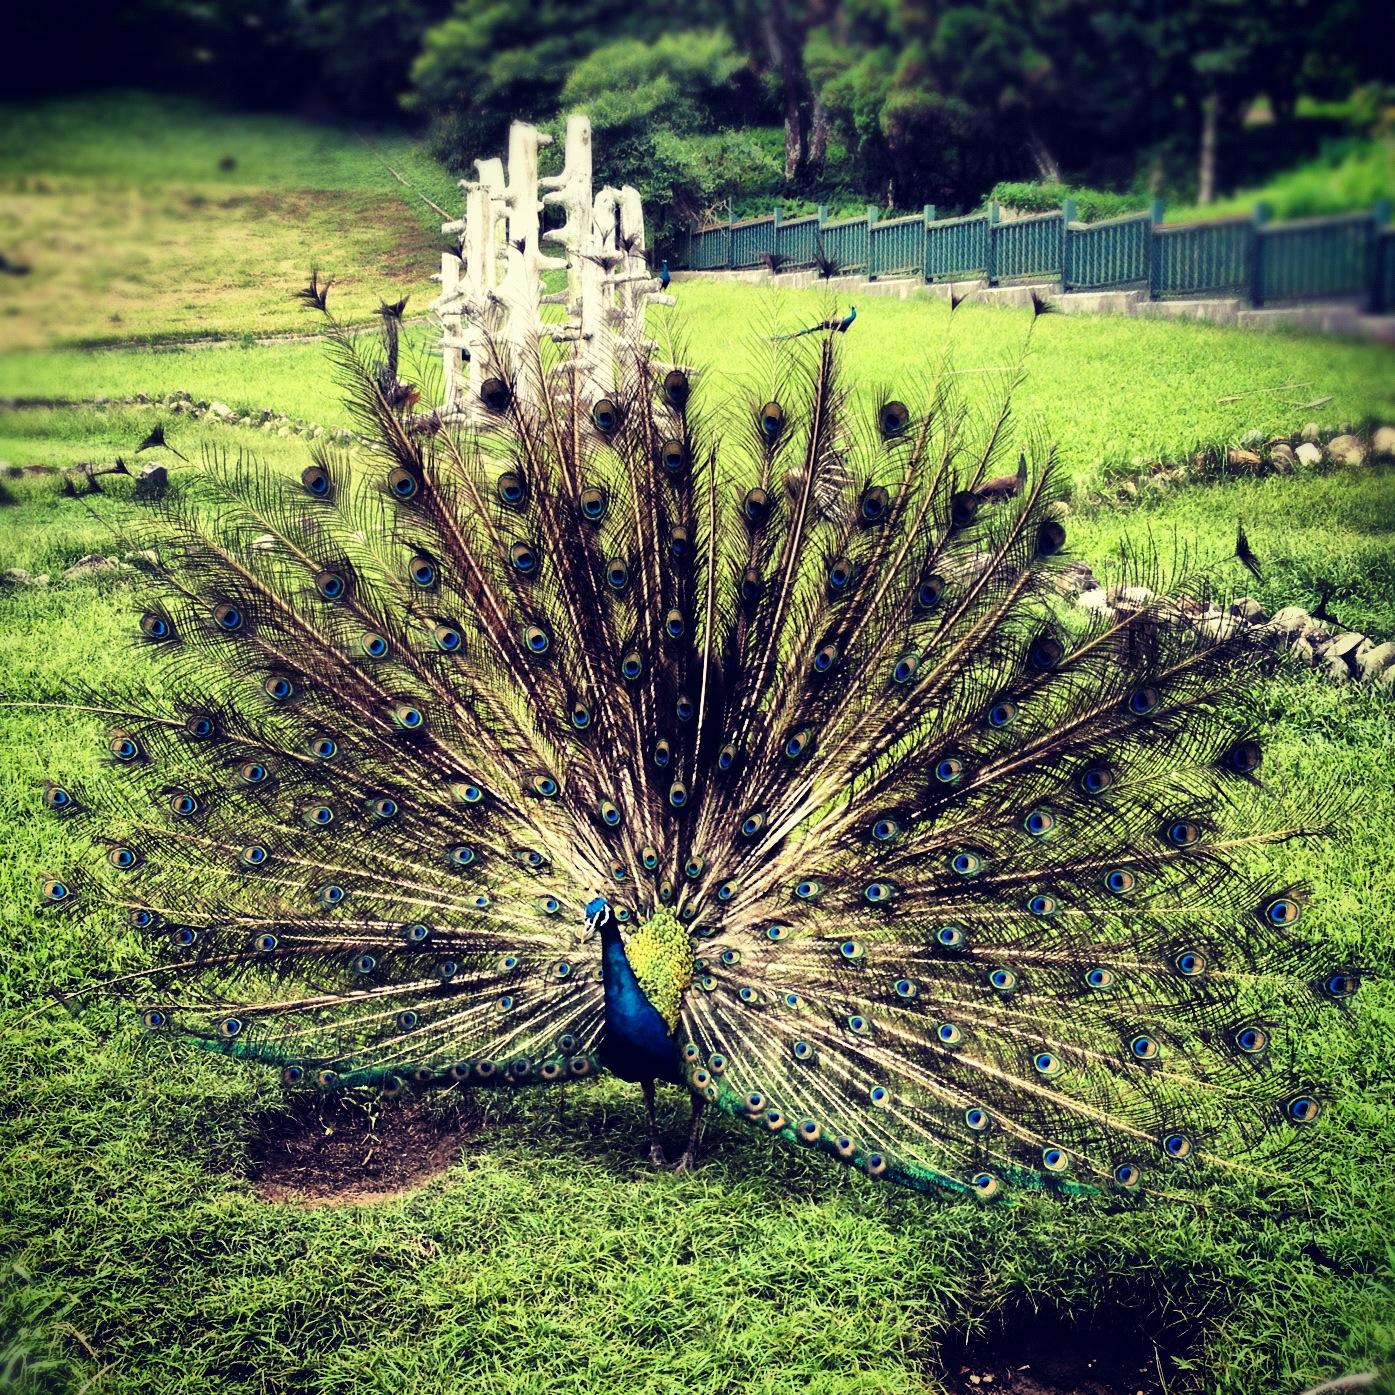 Peacocks during mating season